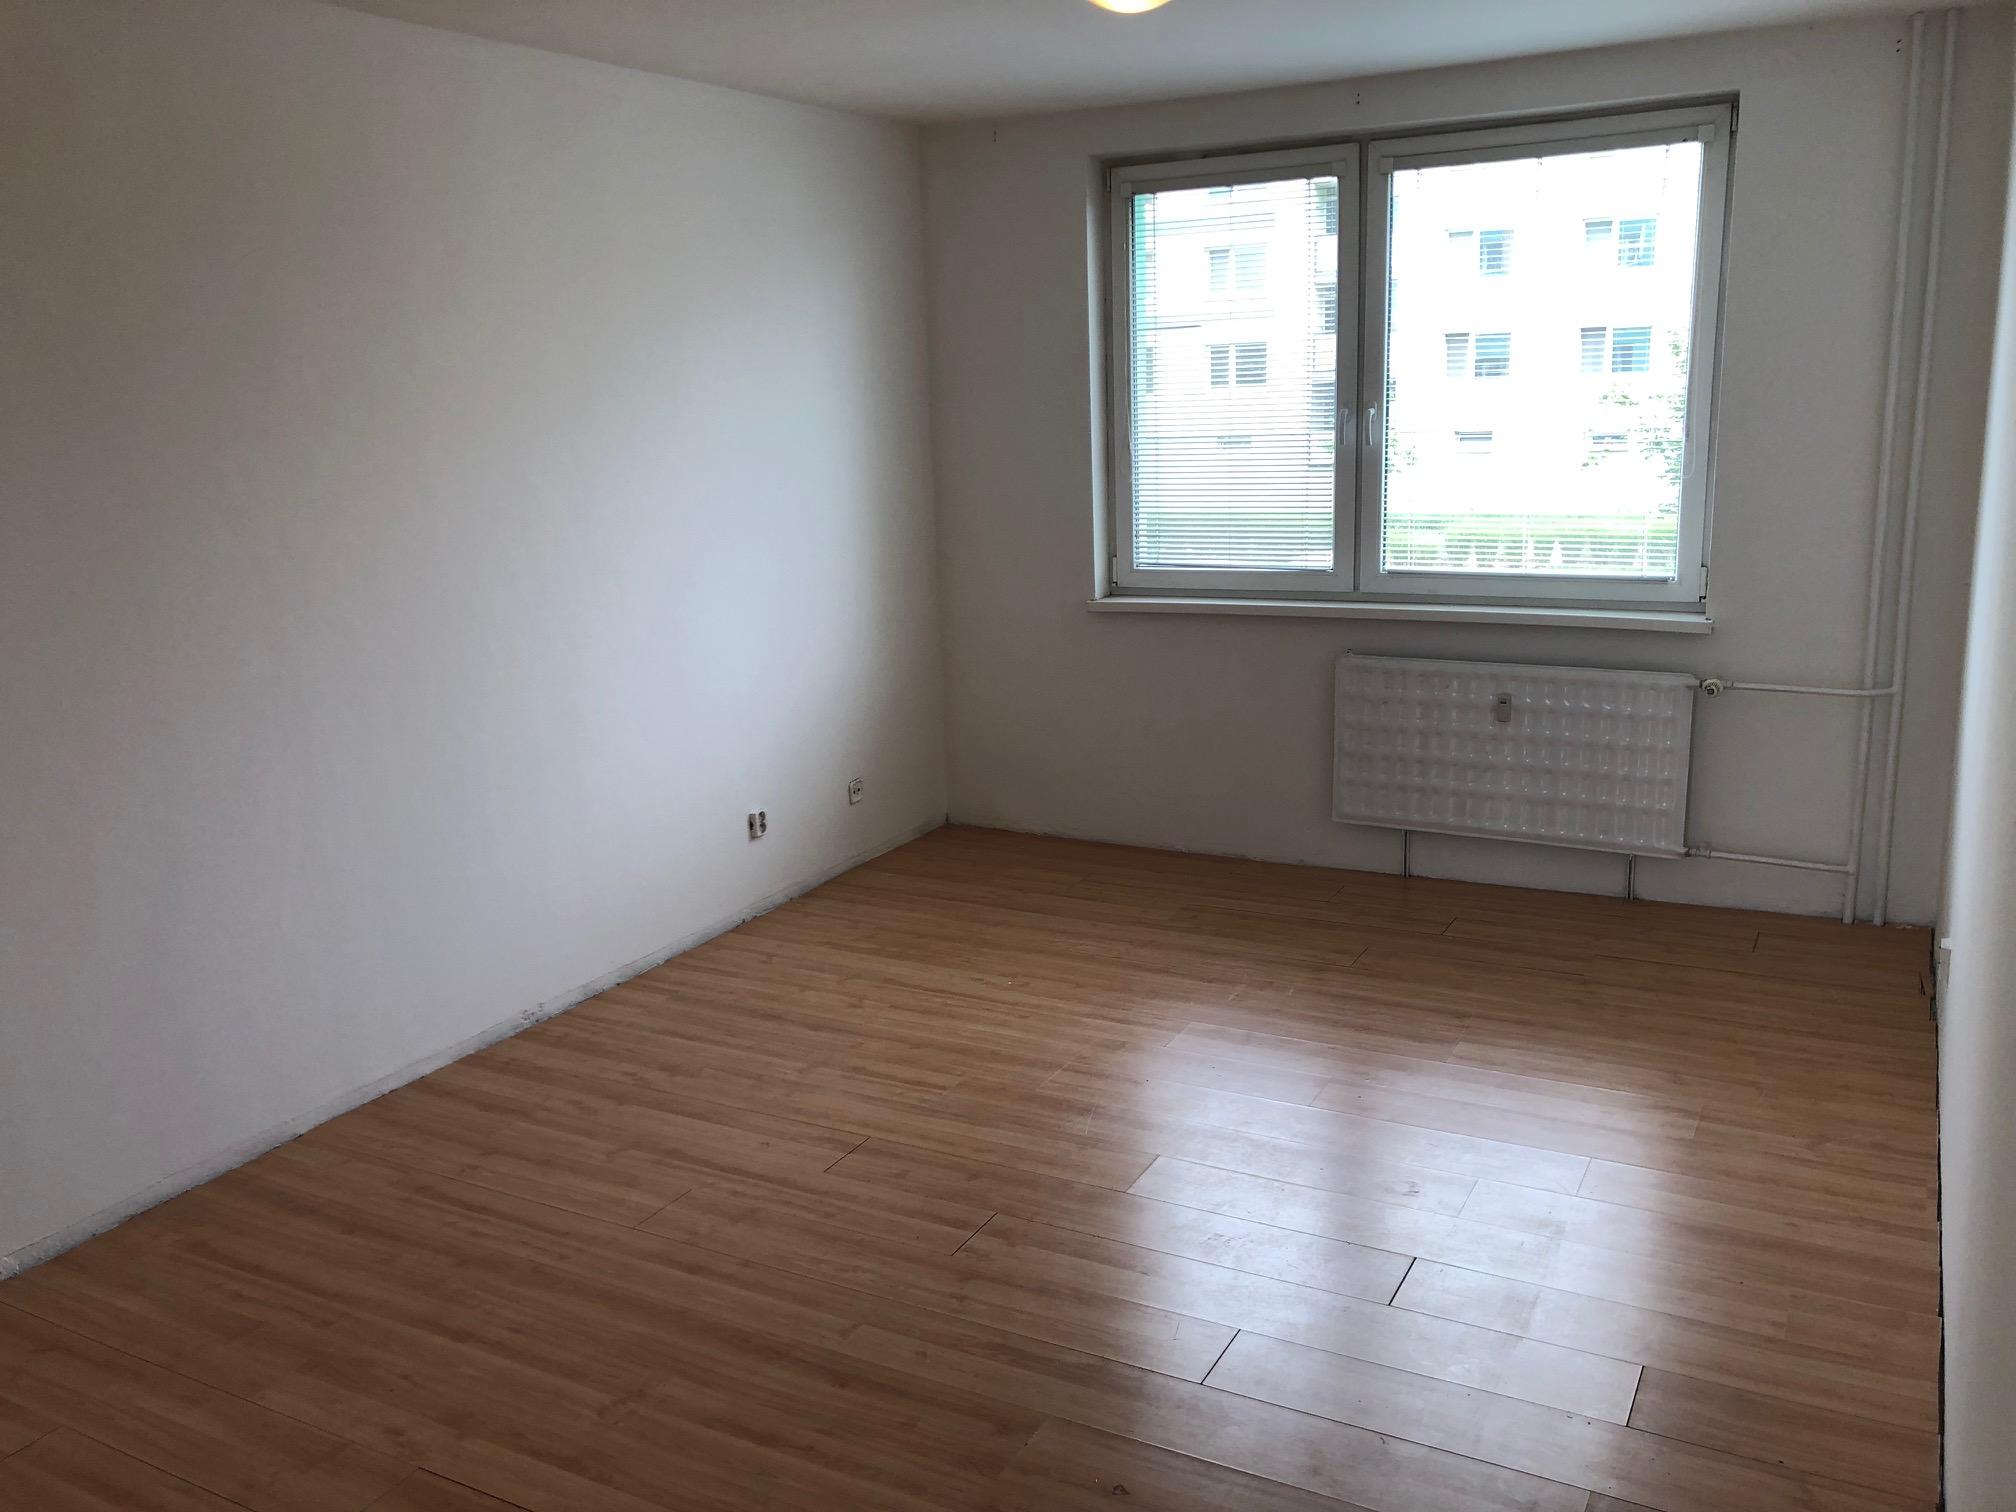 2 izbový byt, 52m2, pivnica, pôvodný stav, Skuteckého, Malacky Juh-24